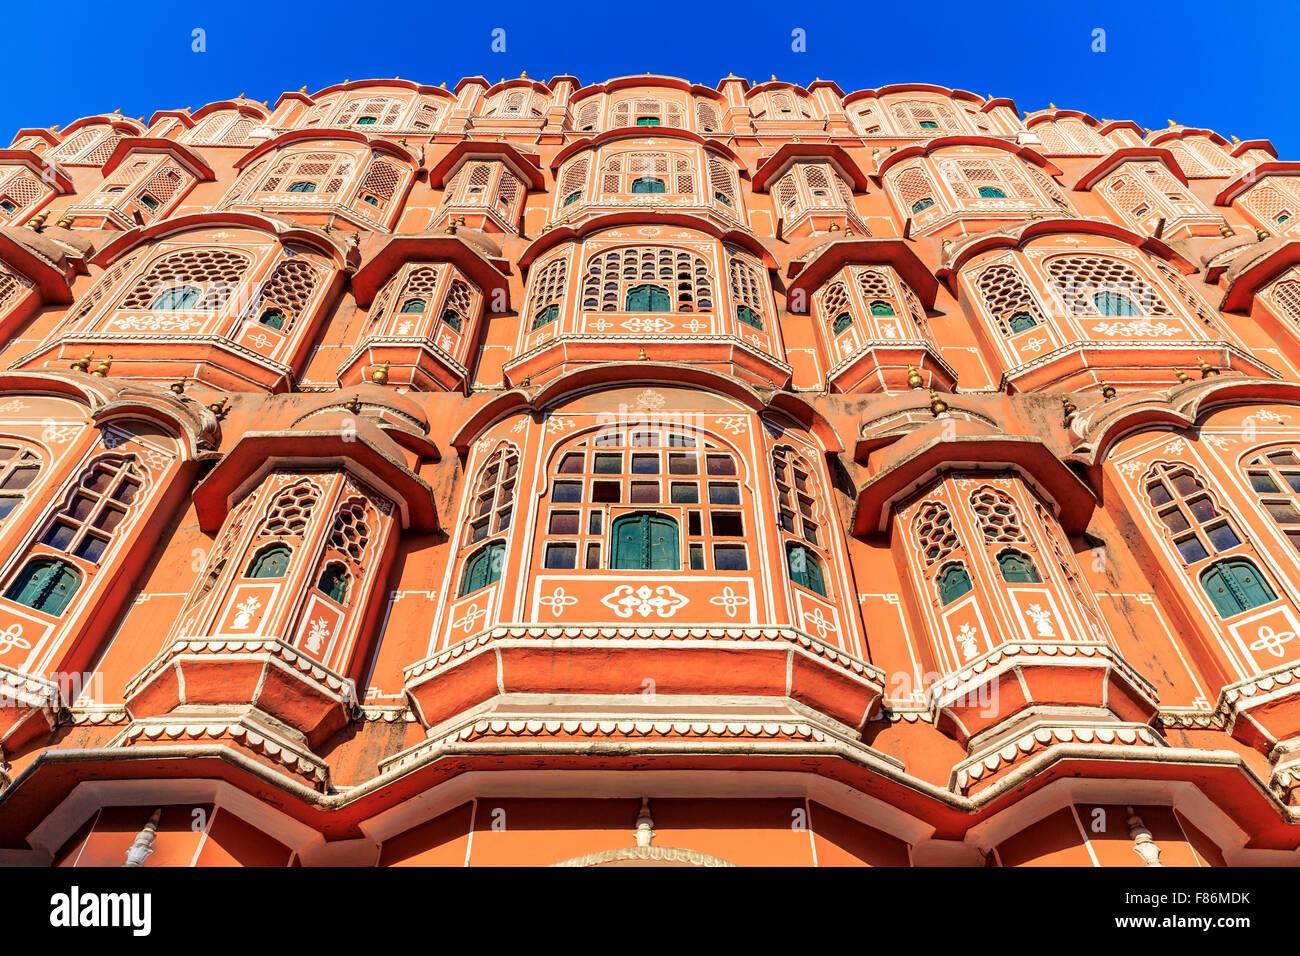 Facciata del Hawa Mahal, Palazzo dei venti, Jaipur, Rajasthan, India Immagini Stock